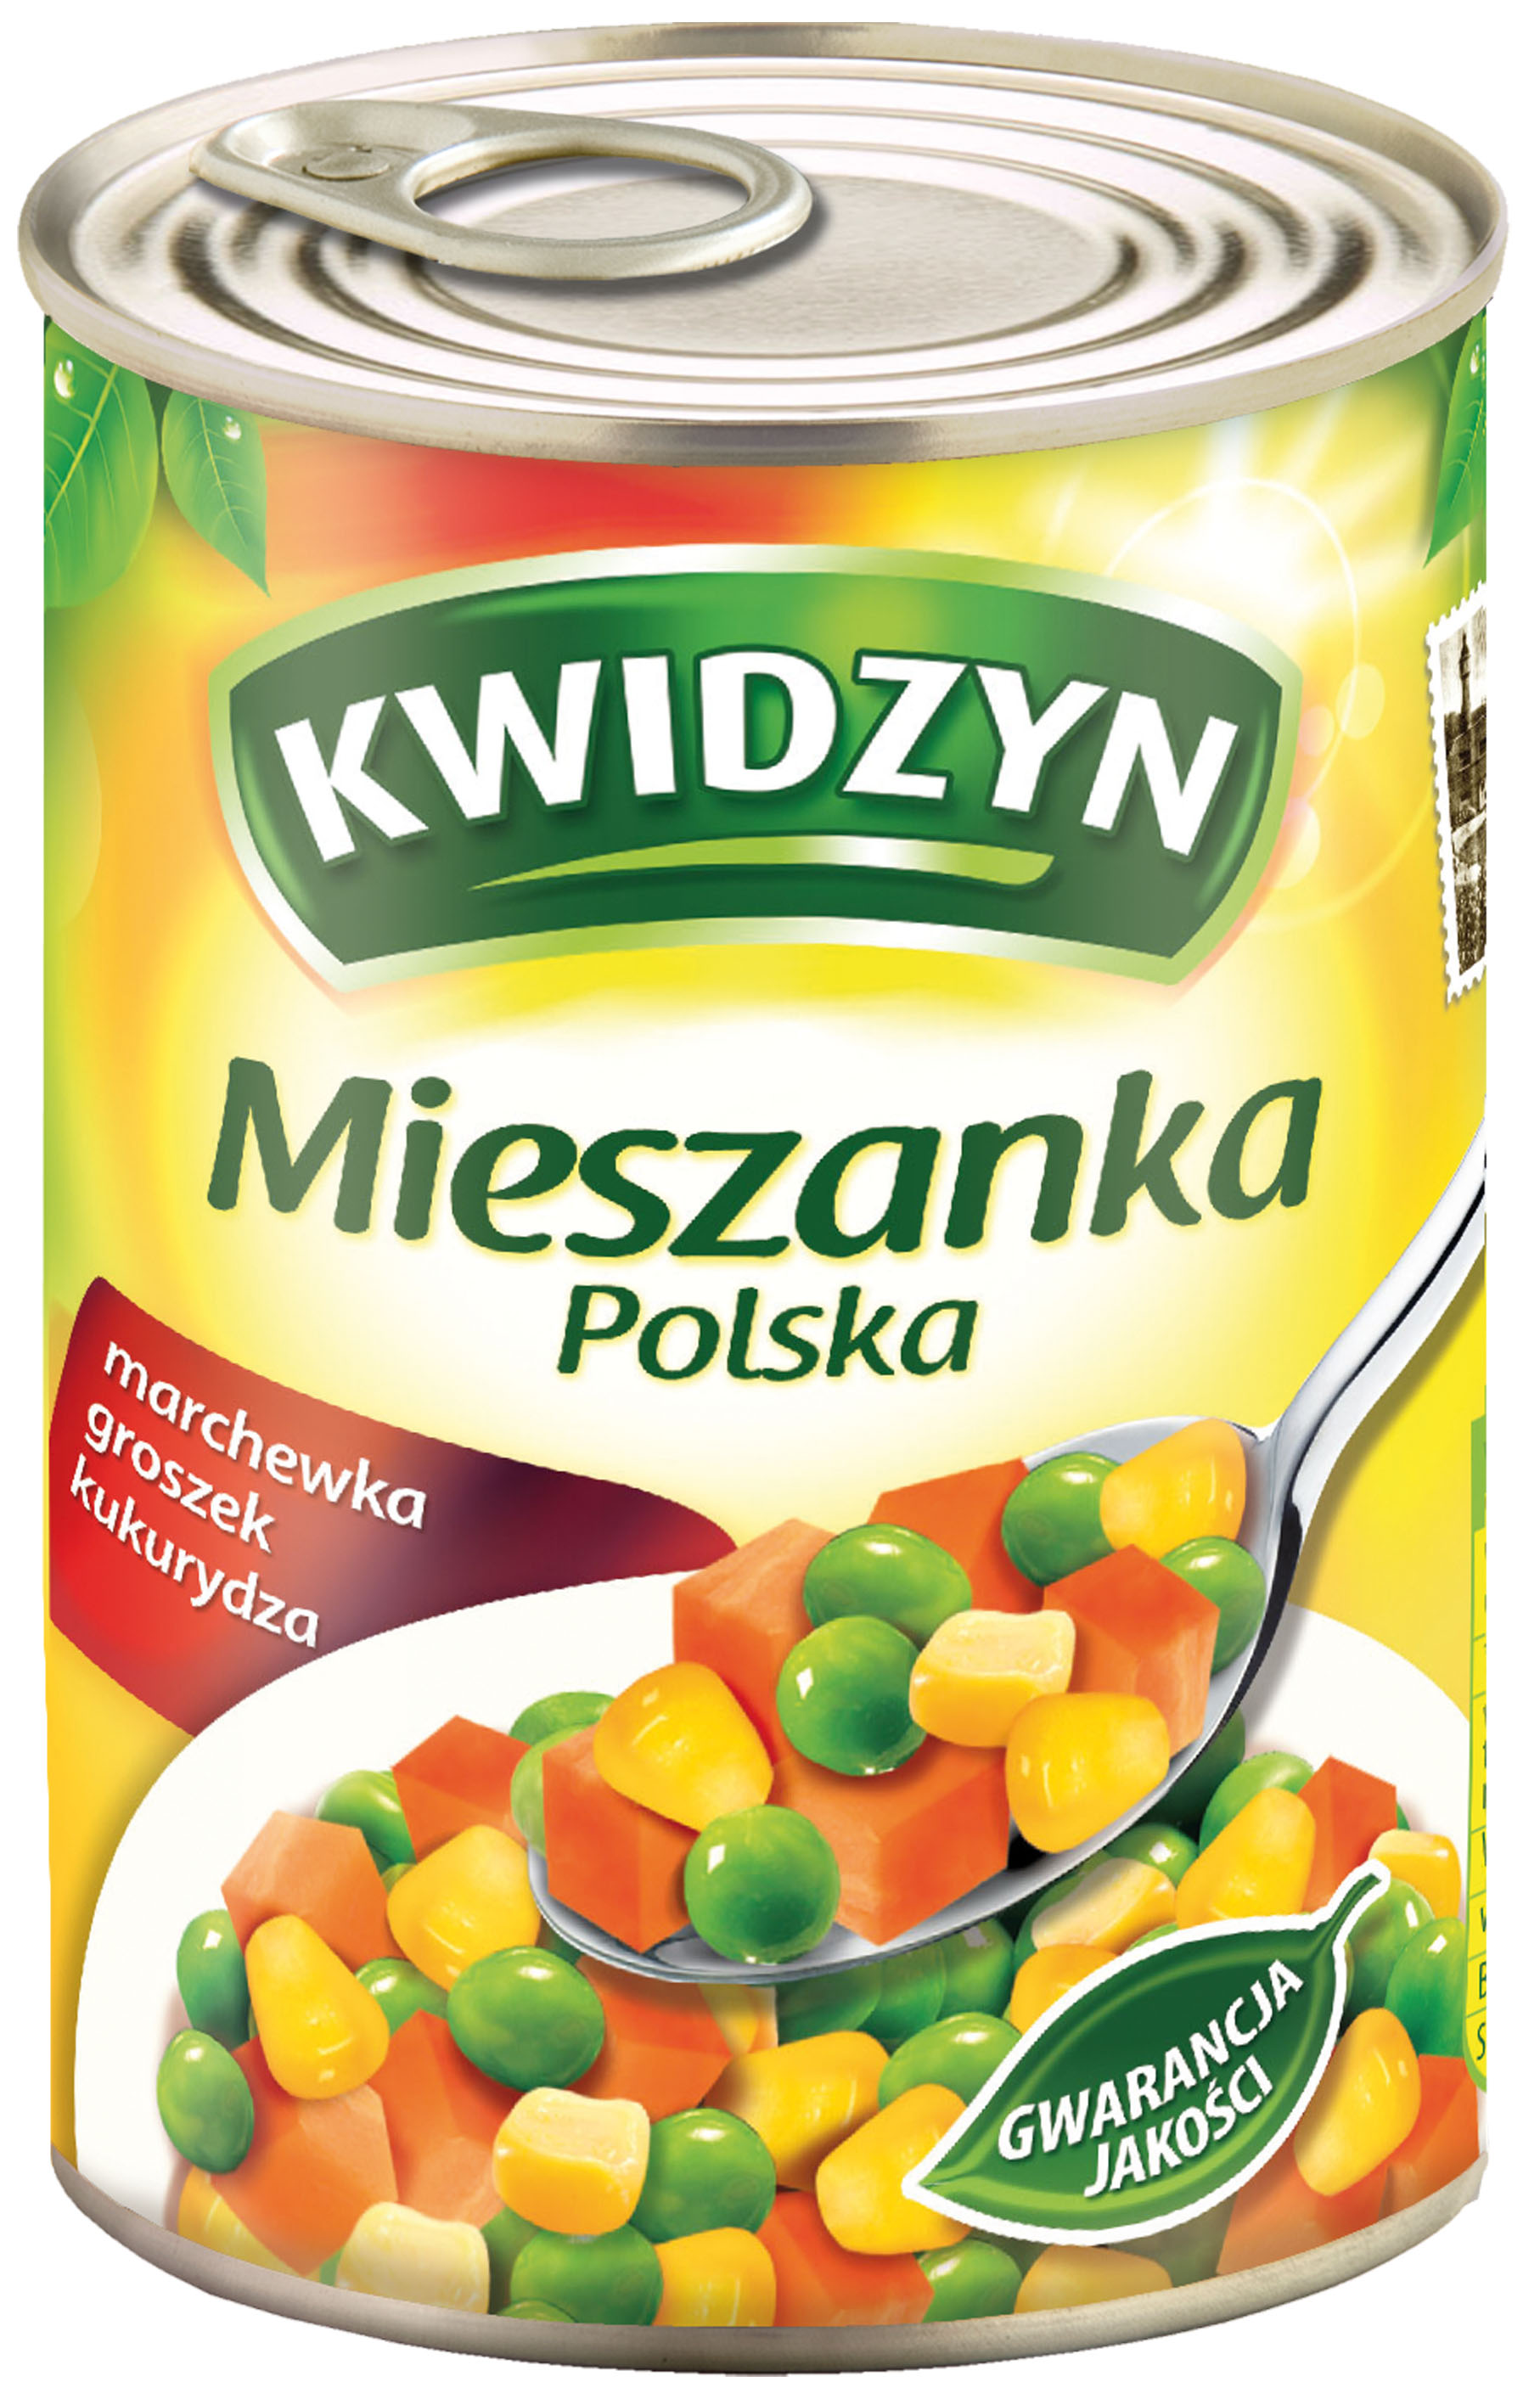 mieszanka polska 400g1